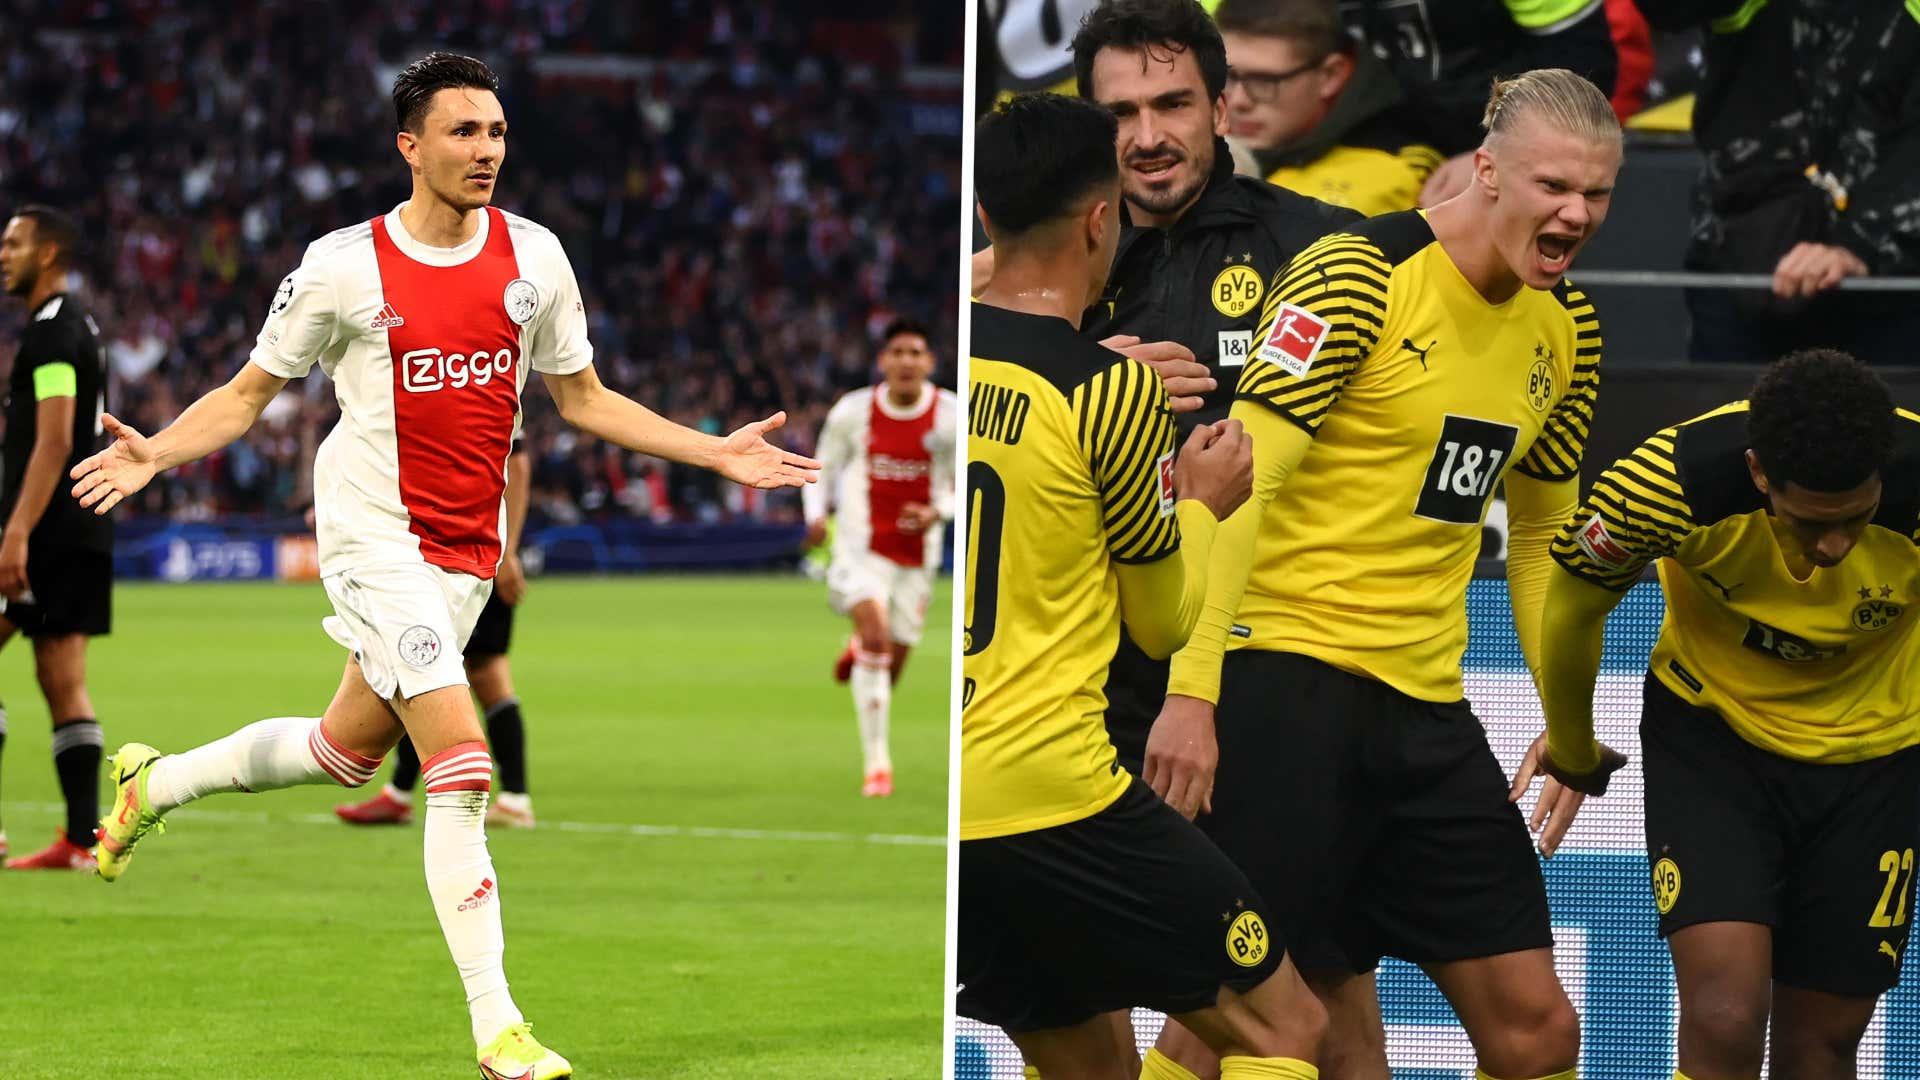 Champions League live: Wo läuft Ajax Amsterdam vs. BVB (Borussia Dortmund) heute? | Goal.com